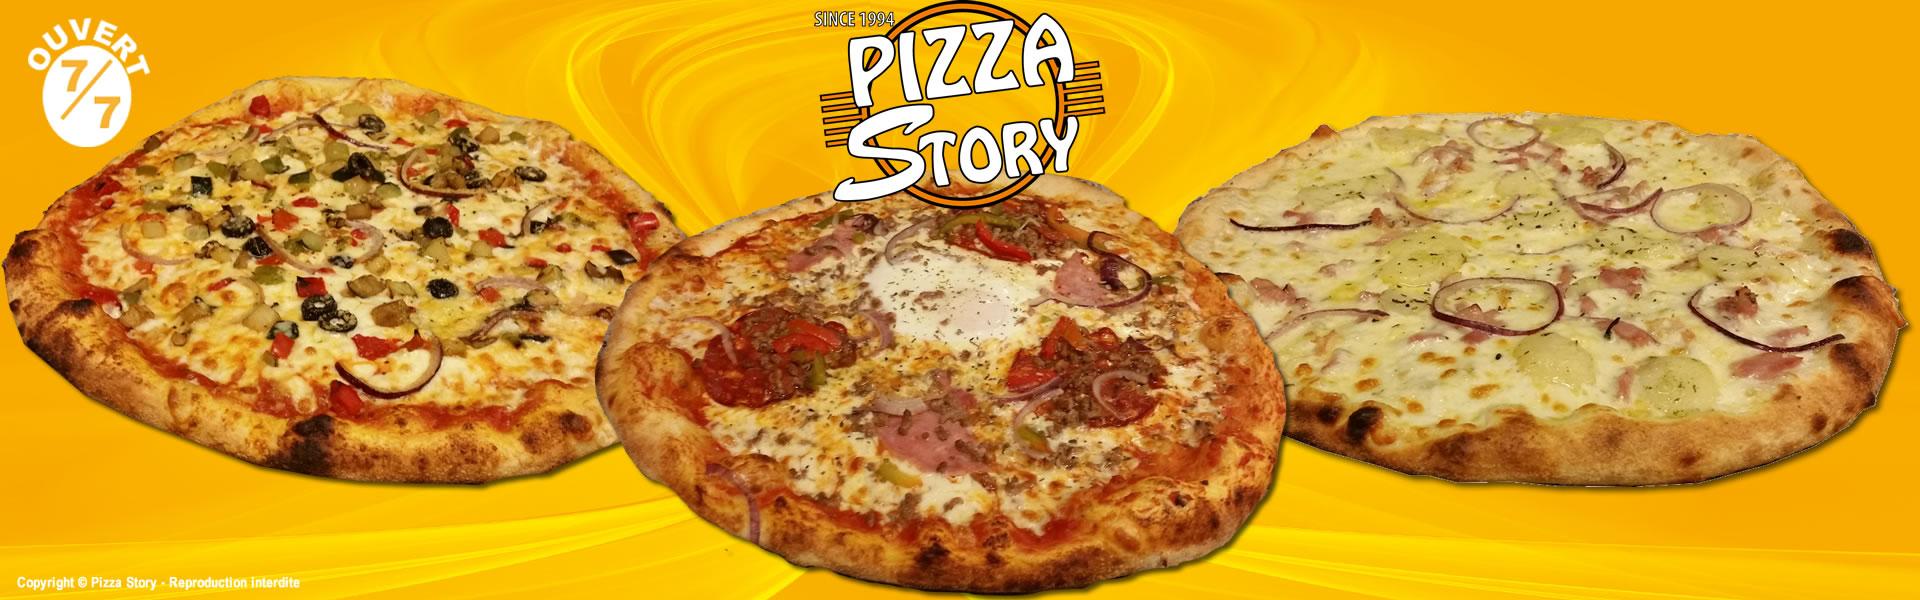 pizza en livraison domicile ou emporter 7j 7 pizza. Black Bedroom Furniture Sets. Home Design Ideas